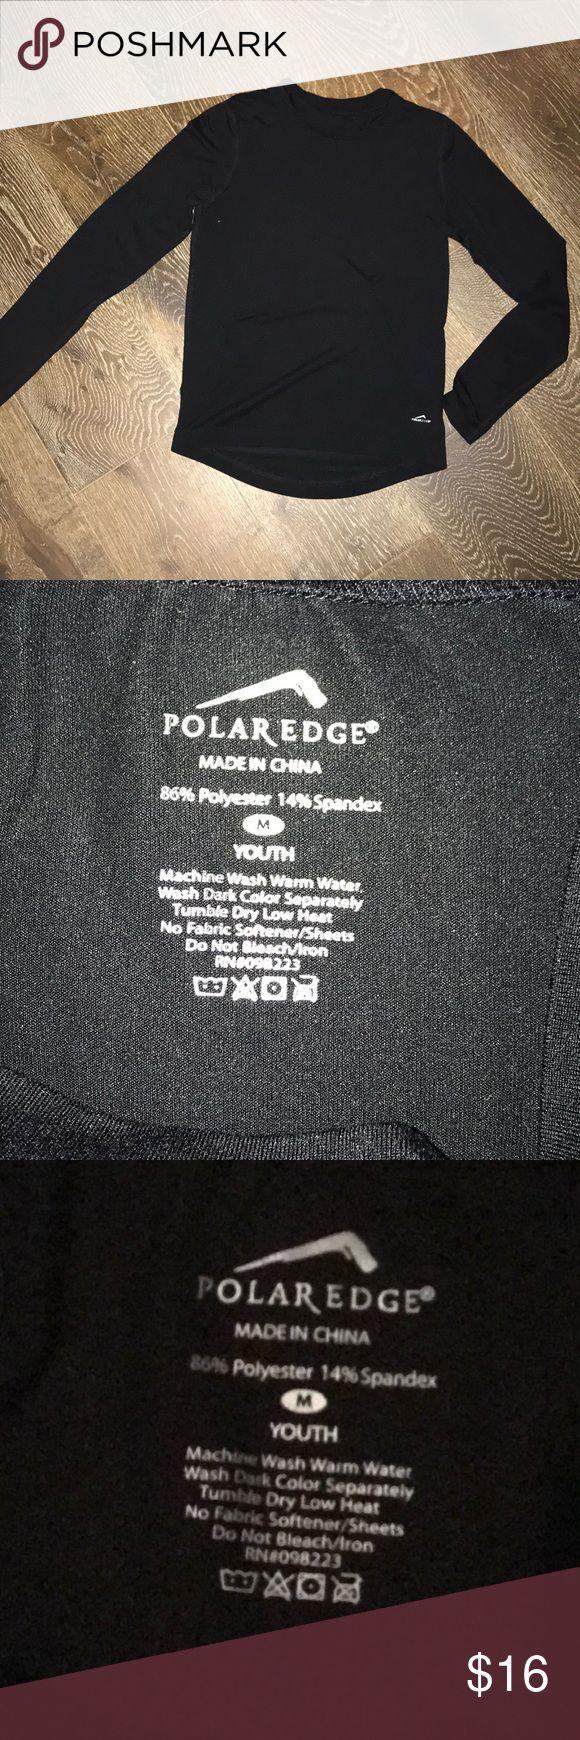 Polar Edge youth med black long sleeve undershirt Polar Edge youth med black long sleeve undershirt Polar Edge Shirts & Tops Tees - Long Sleeve